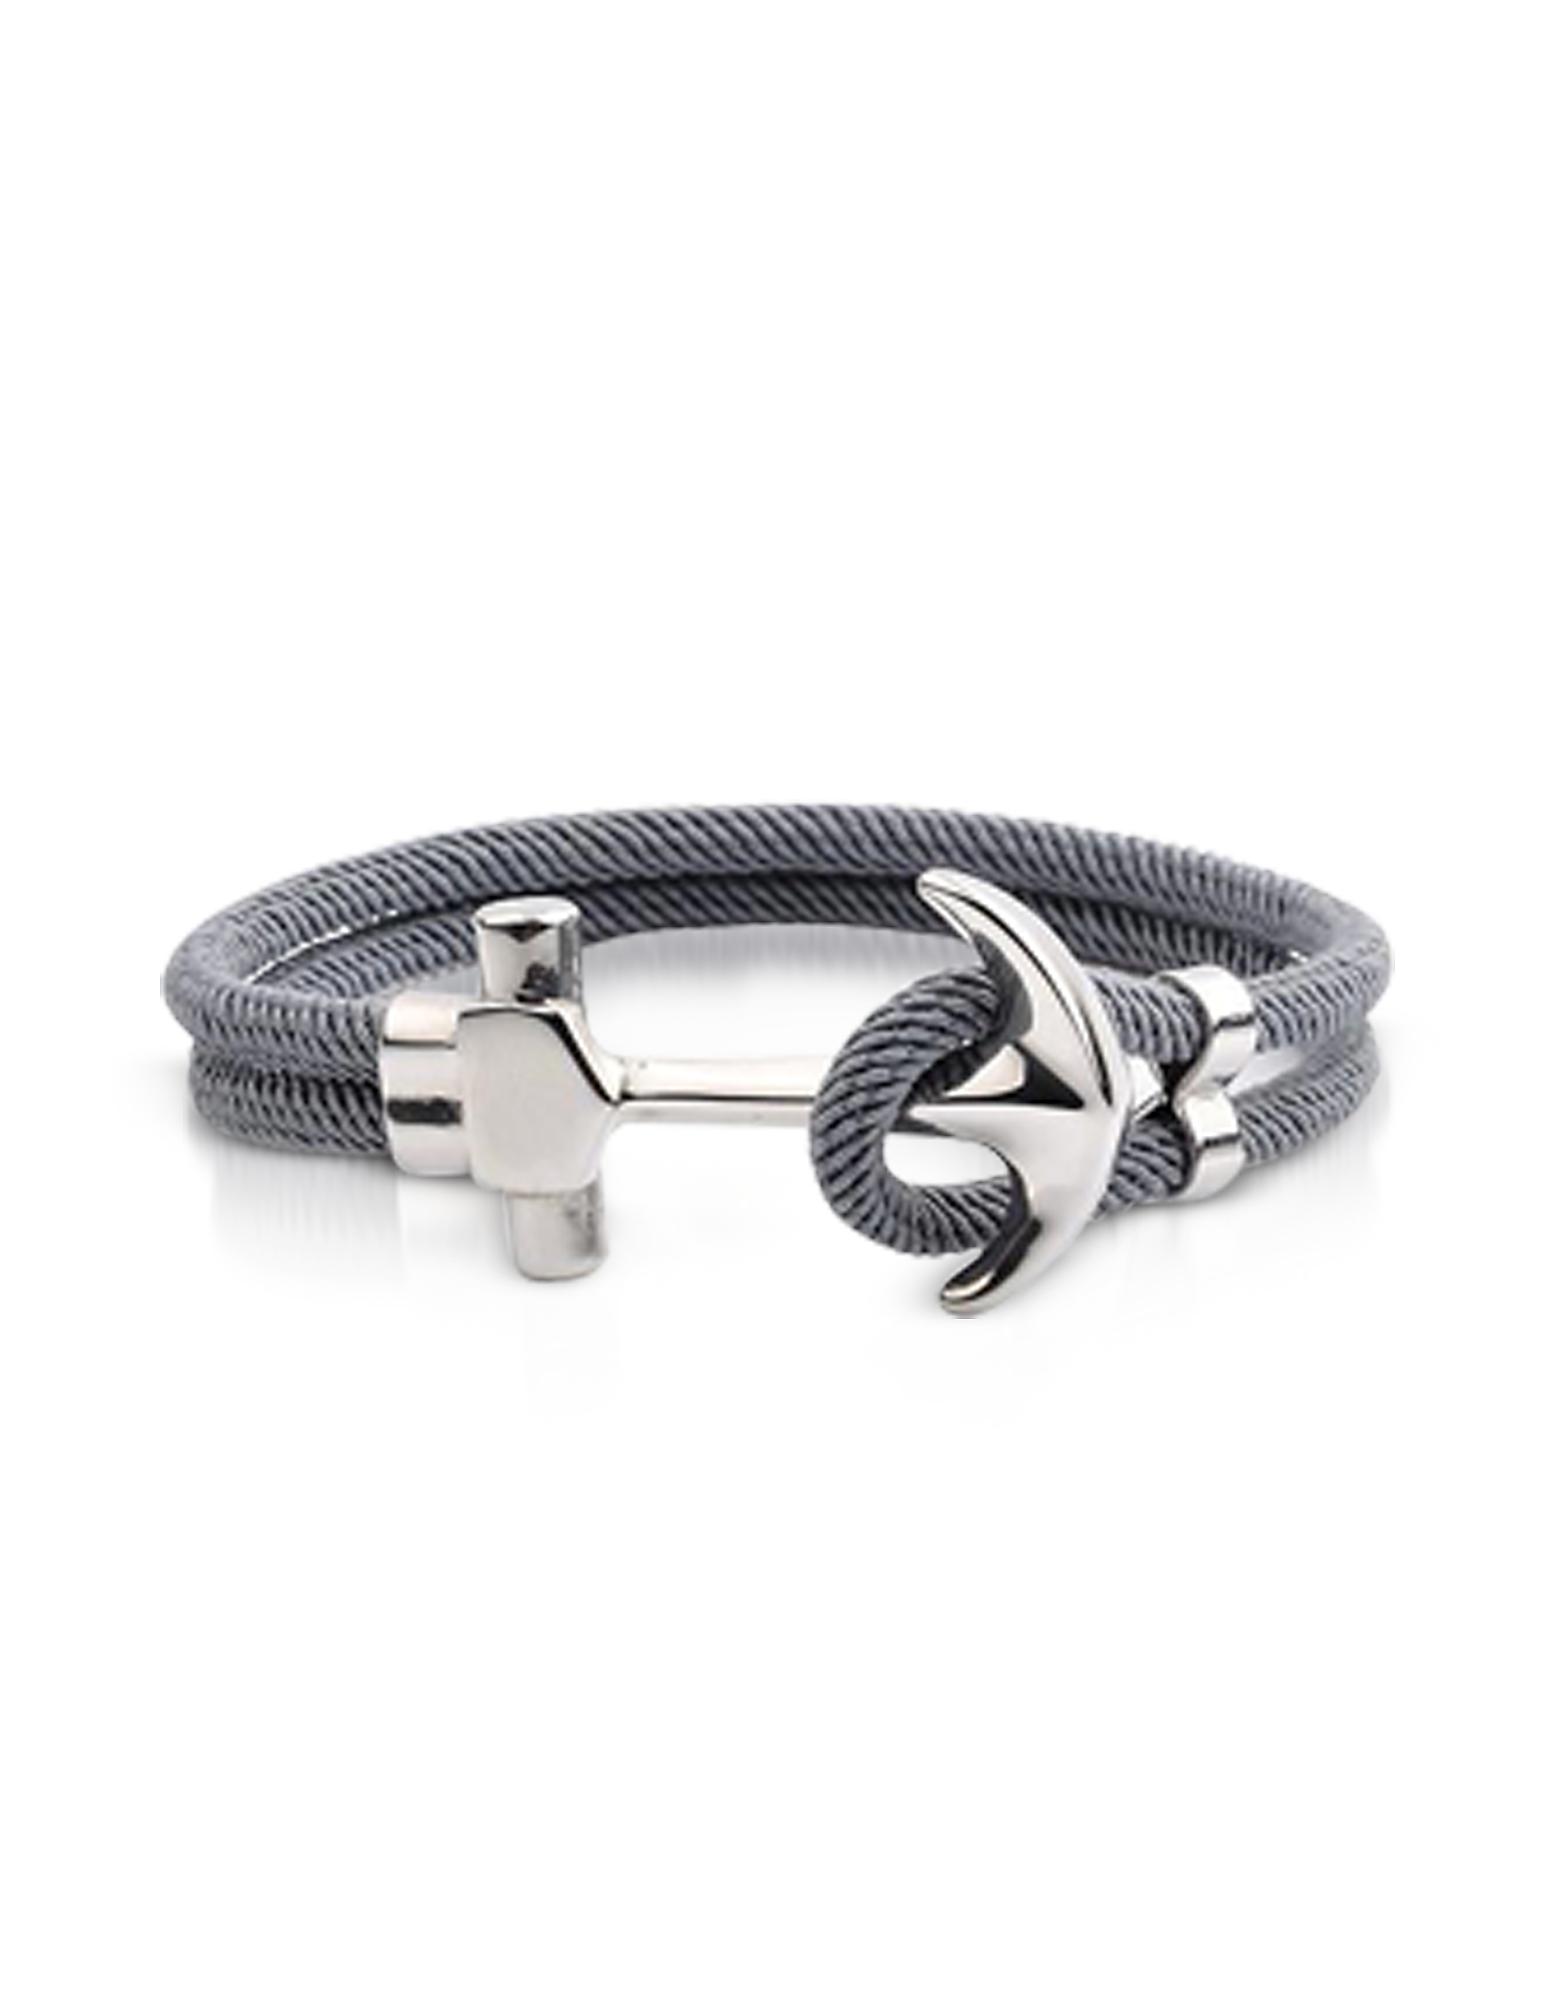 Forzieri Men's Bracelets, Nautical Rope Double Bracelet w/Anchor